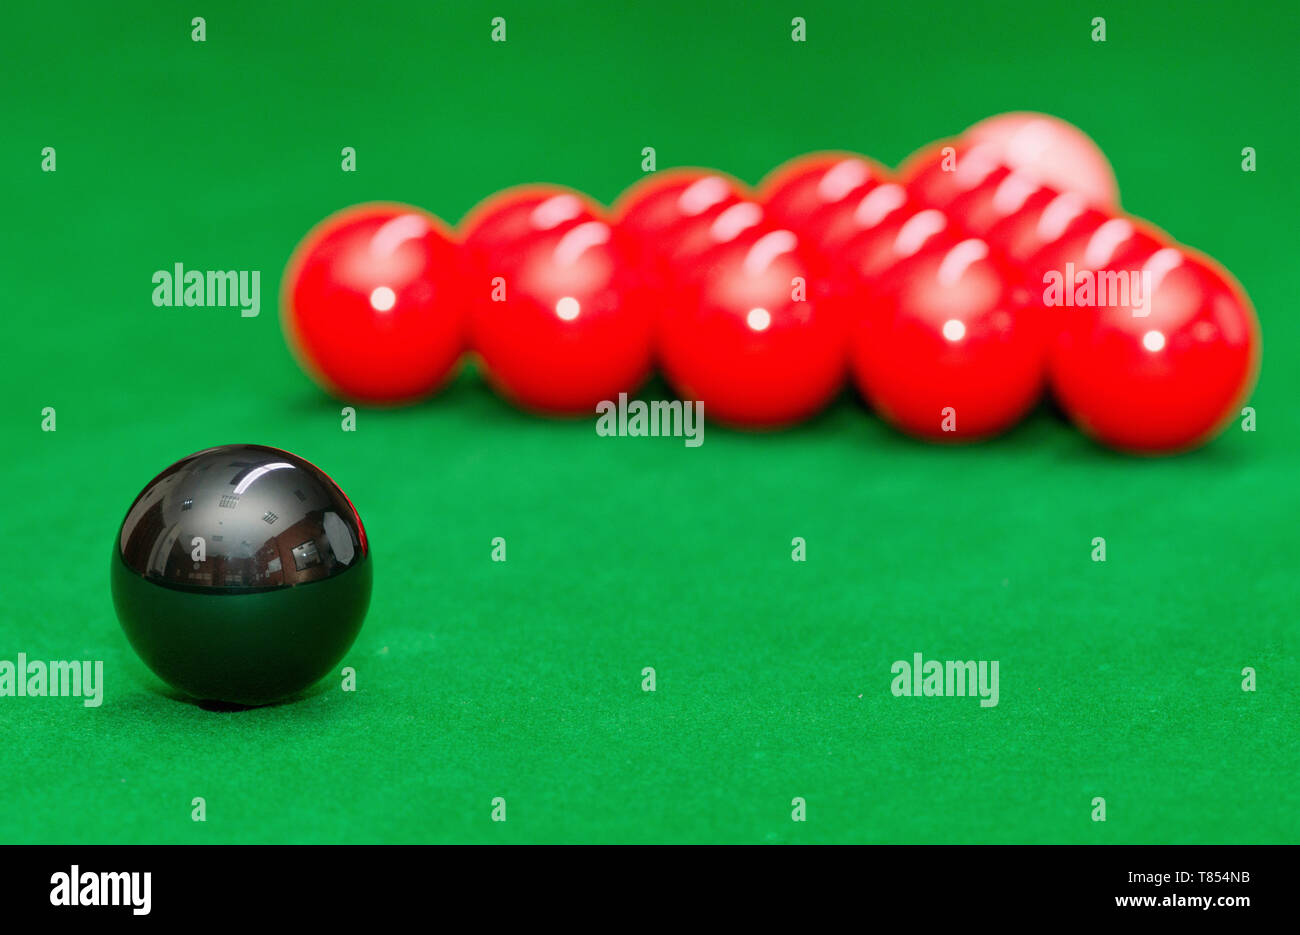 Snooker balls in starting position - Stock Image